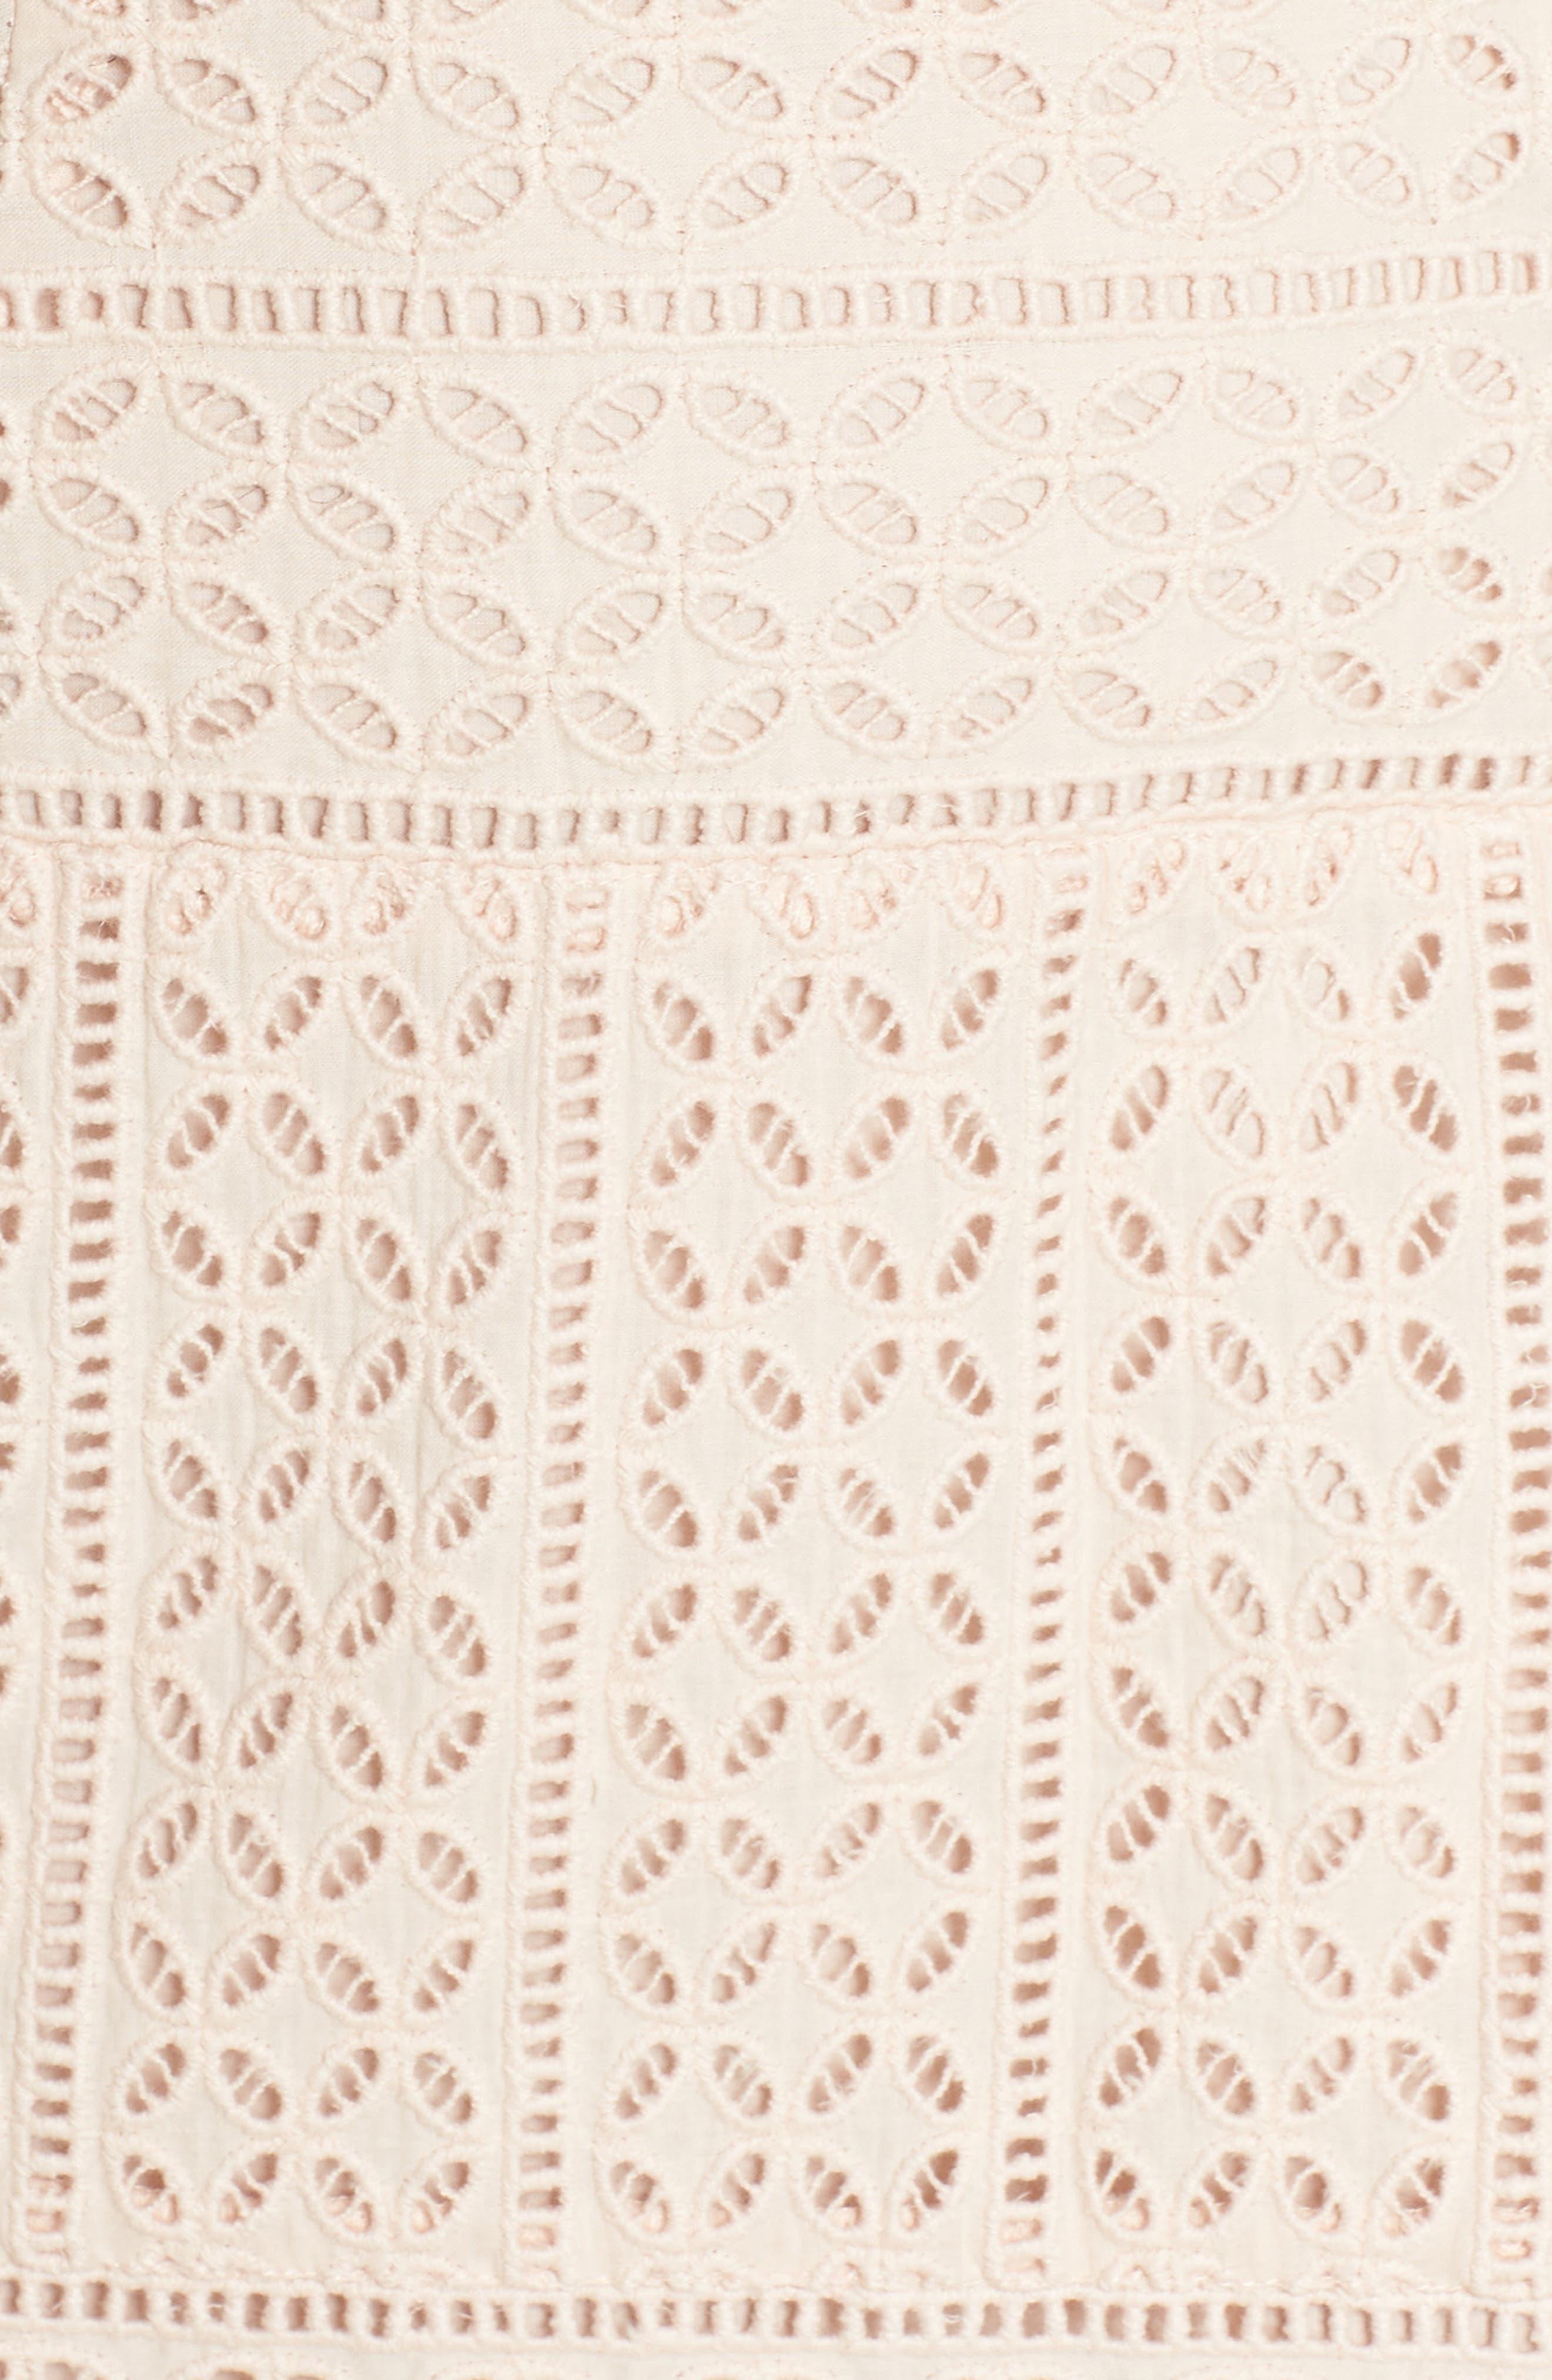 Schiffley Summer Cage Cotton Dress,                             Alternate thumbnail 6, color,                             687